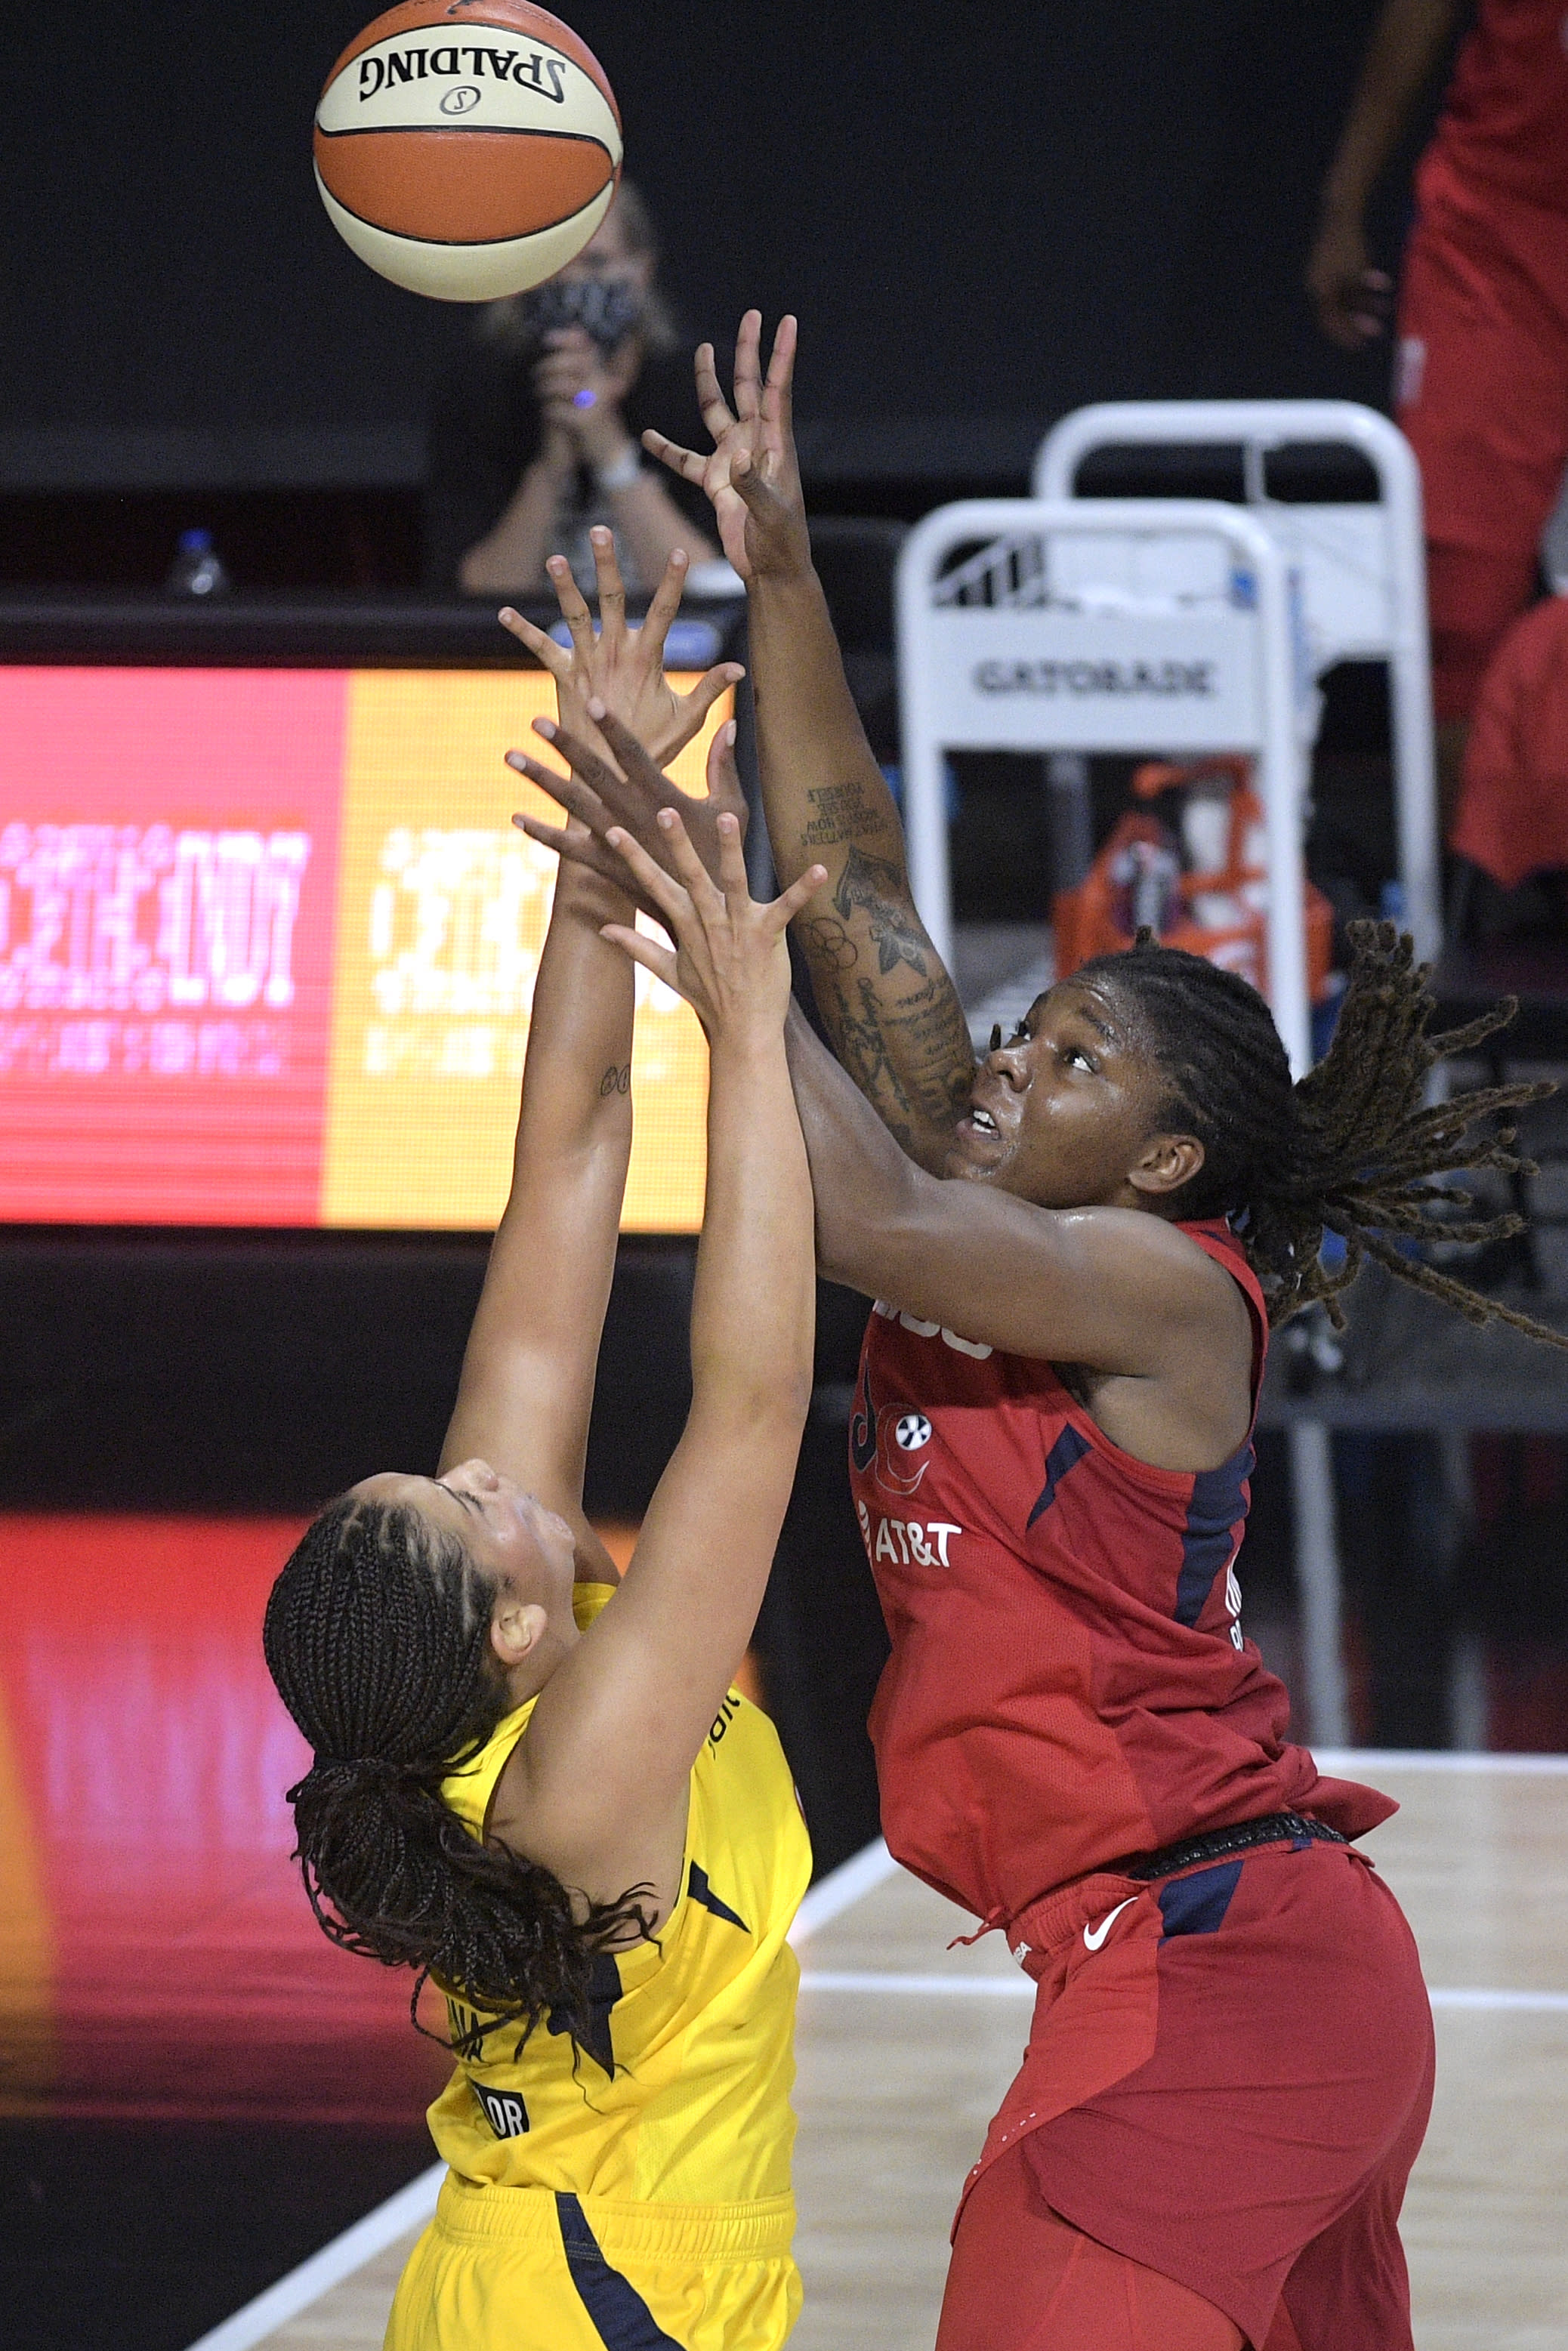 Washington Mystics forward Myisha Hines-Allen, right goes up to shoot in front of Indiana Fever forward Natalie Achonwa during the first half of a WNBA basketball game, Saturday, July 25, 2020, in Ellenton, Fla. (AP Photo/Phelan M. Ebenhack)